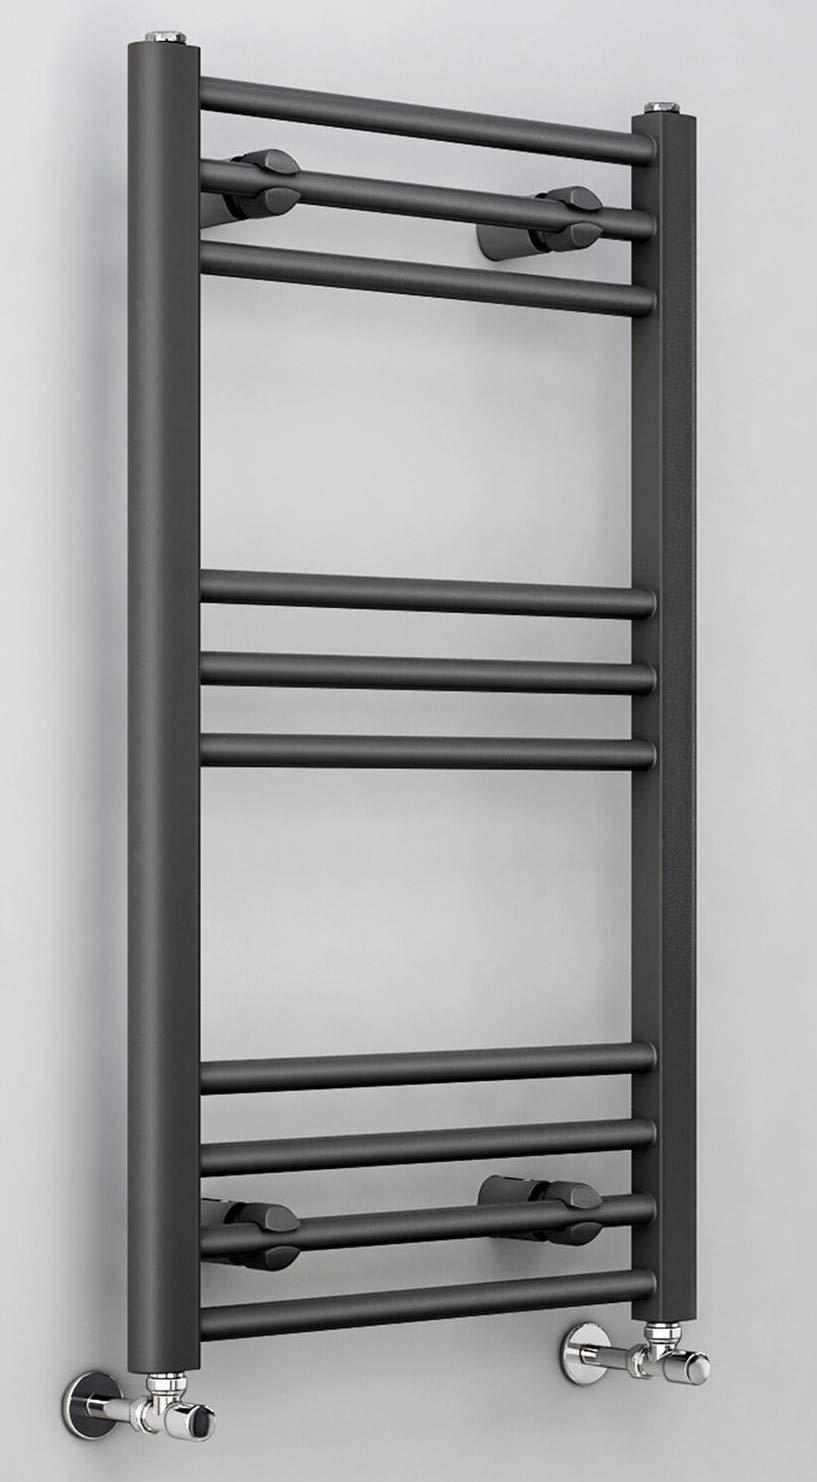 Requena Heated Towel Rail Anthracite Grey Bathroom Ladder Radiator All Sizes Flat, 1200x450